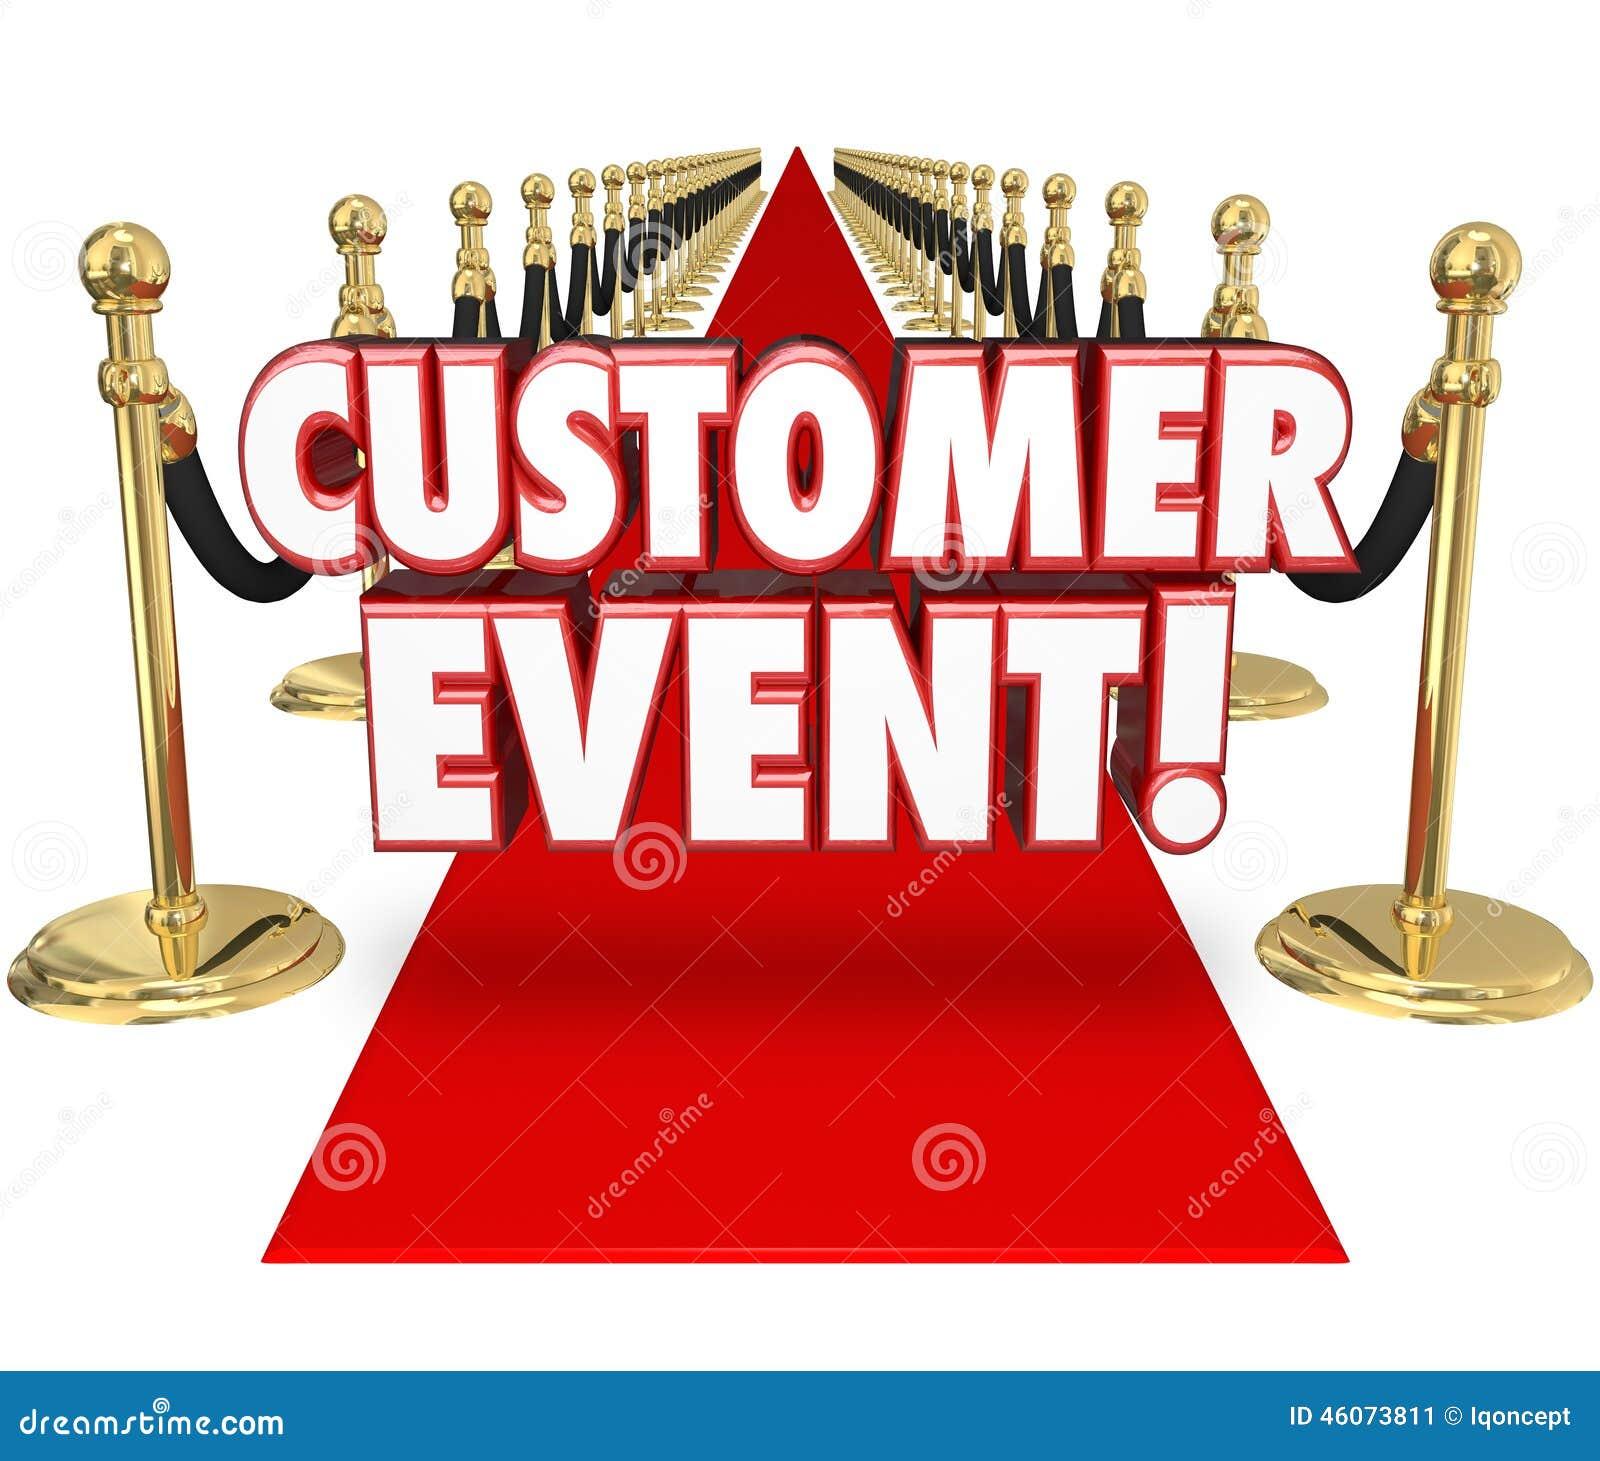 Customer Event Appreciation Celebration Red Carpet